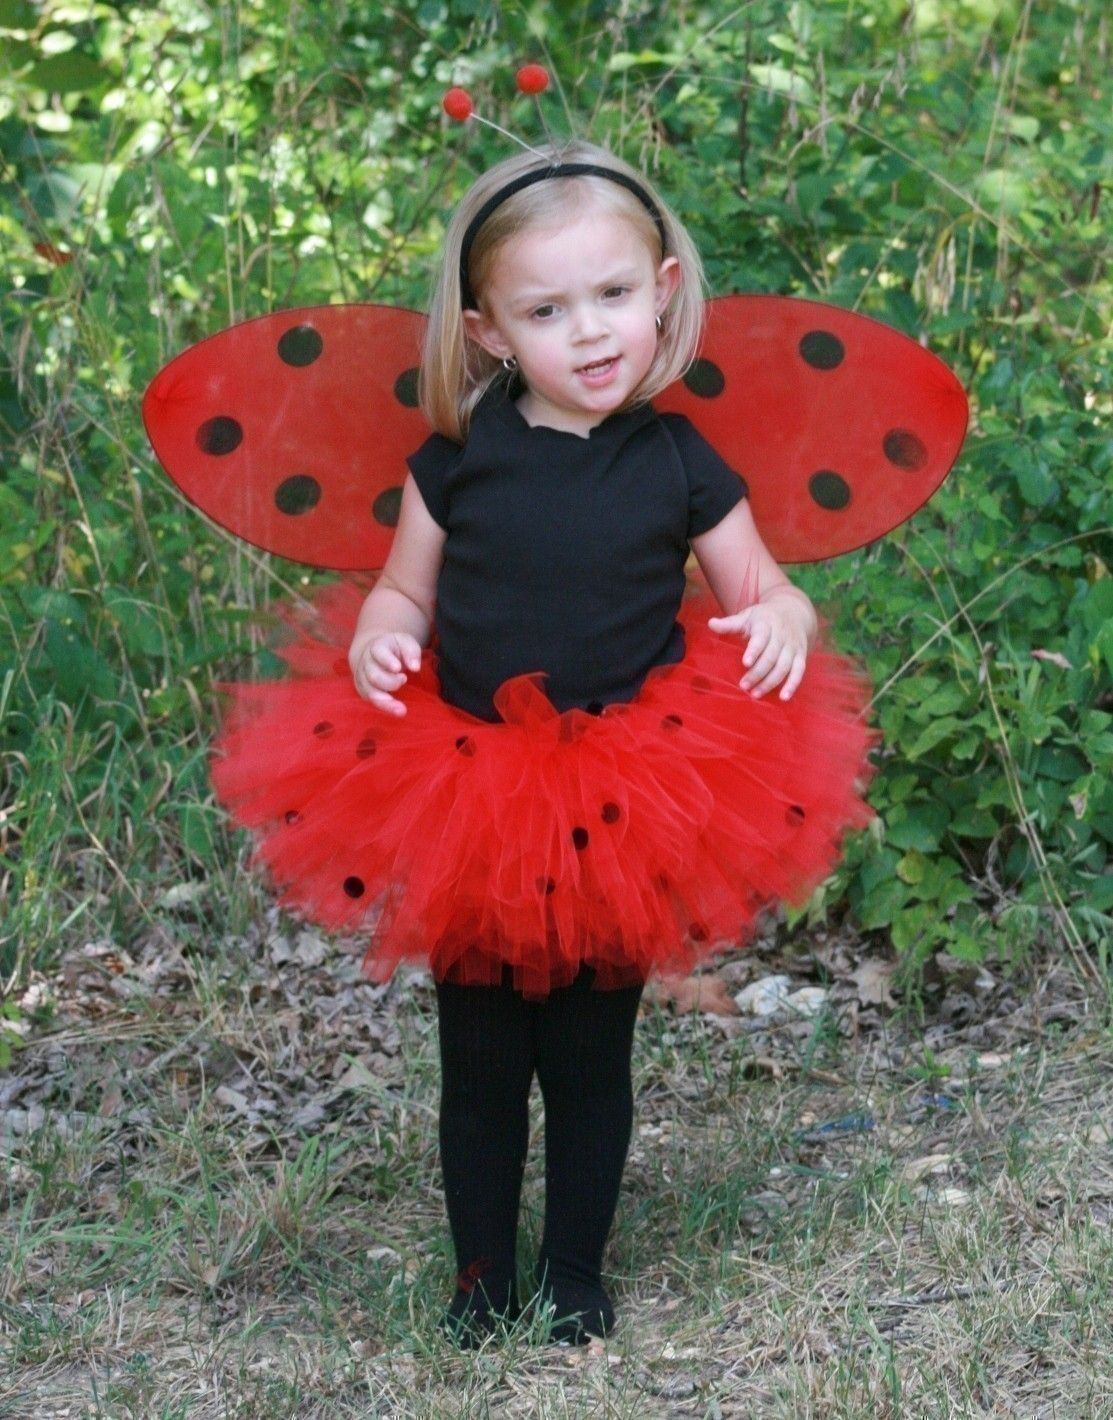 Ladybug Costume. Facebook - .facebook.com/outdoorc&us Our website .outdoorc&us.org/  sc 1 st  Pinterest & Ladybug Red Black FULL Custom Boutique Tutu Baby Toddler 0-12mo 1-2 ...